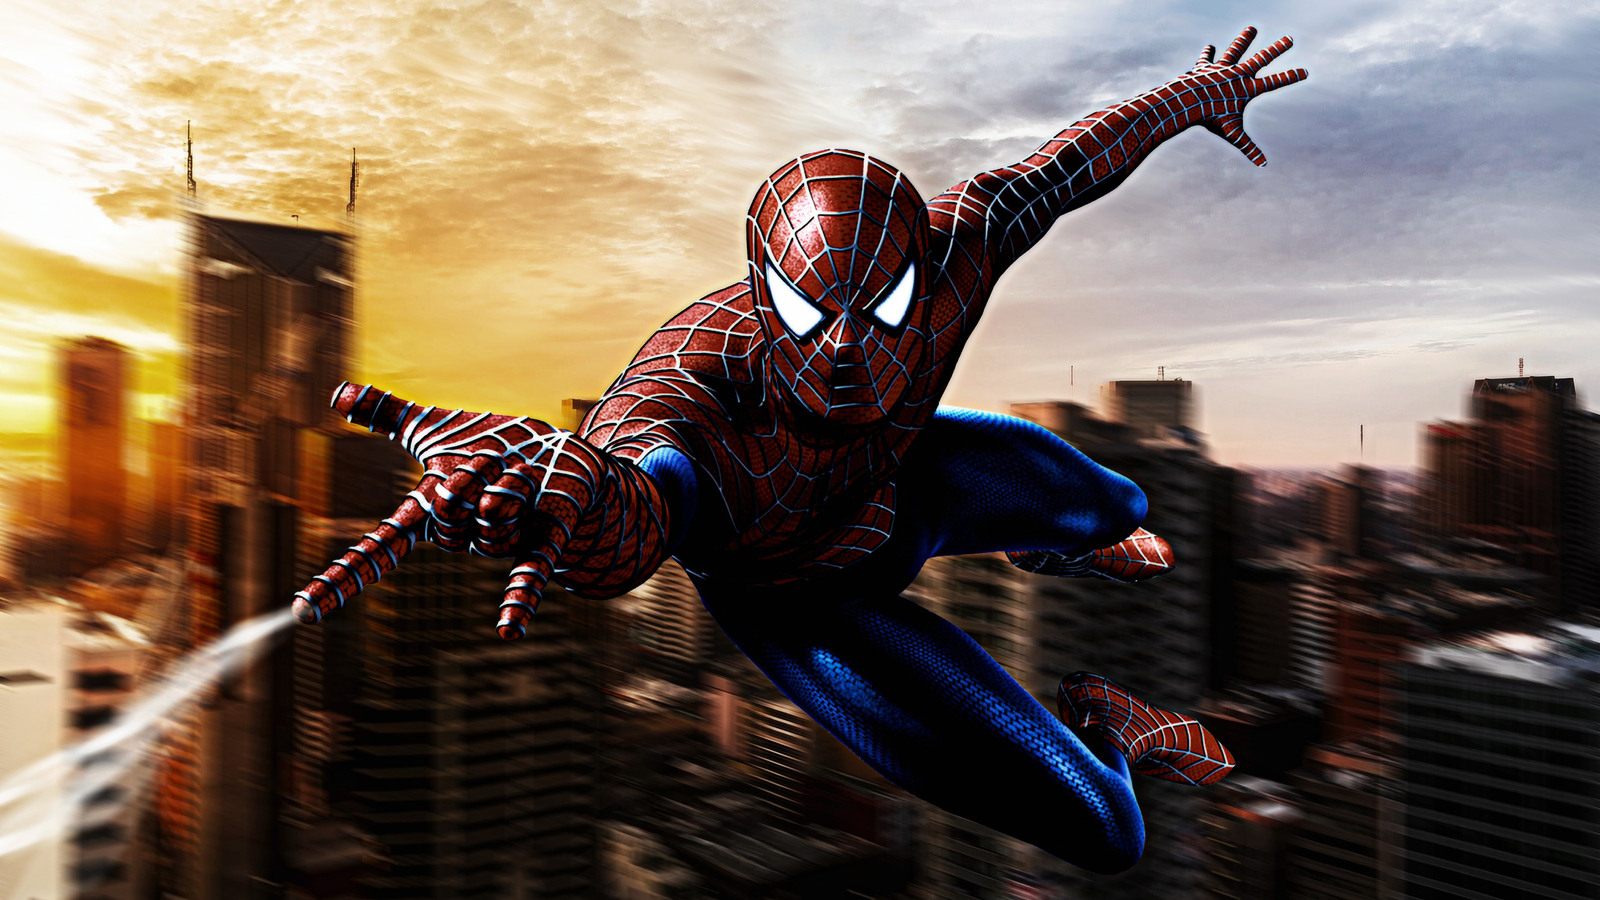 4k-spider-man-pf.jpg